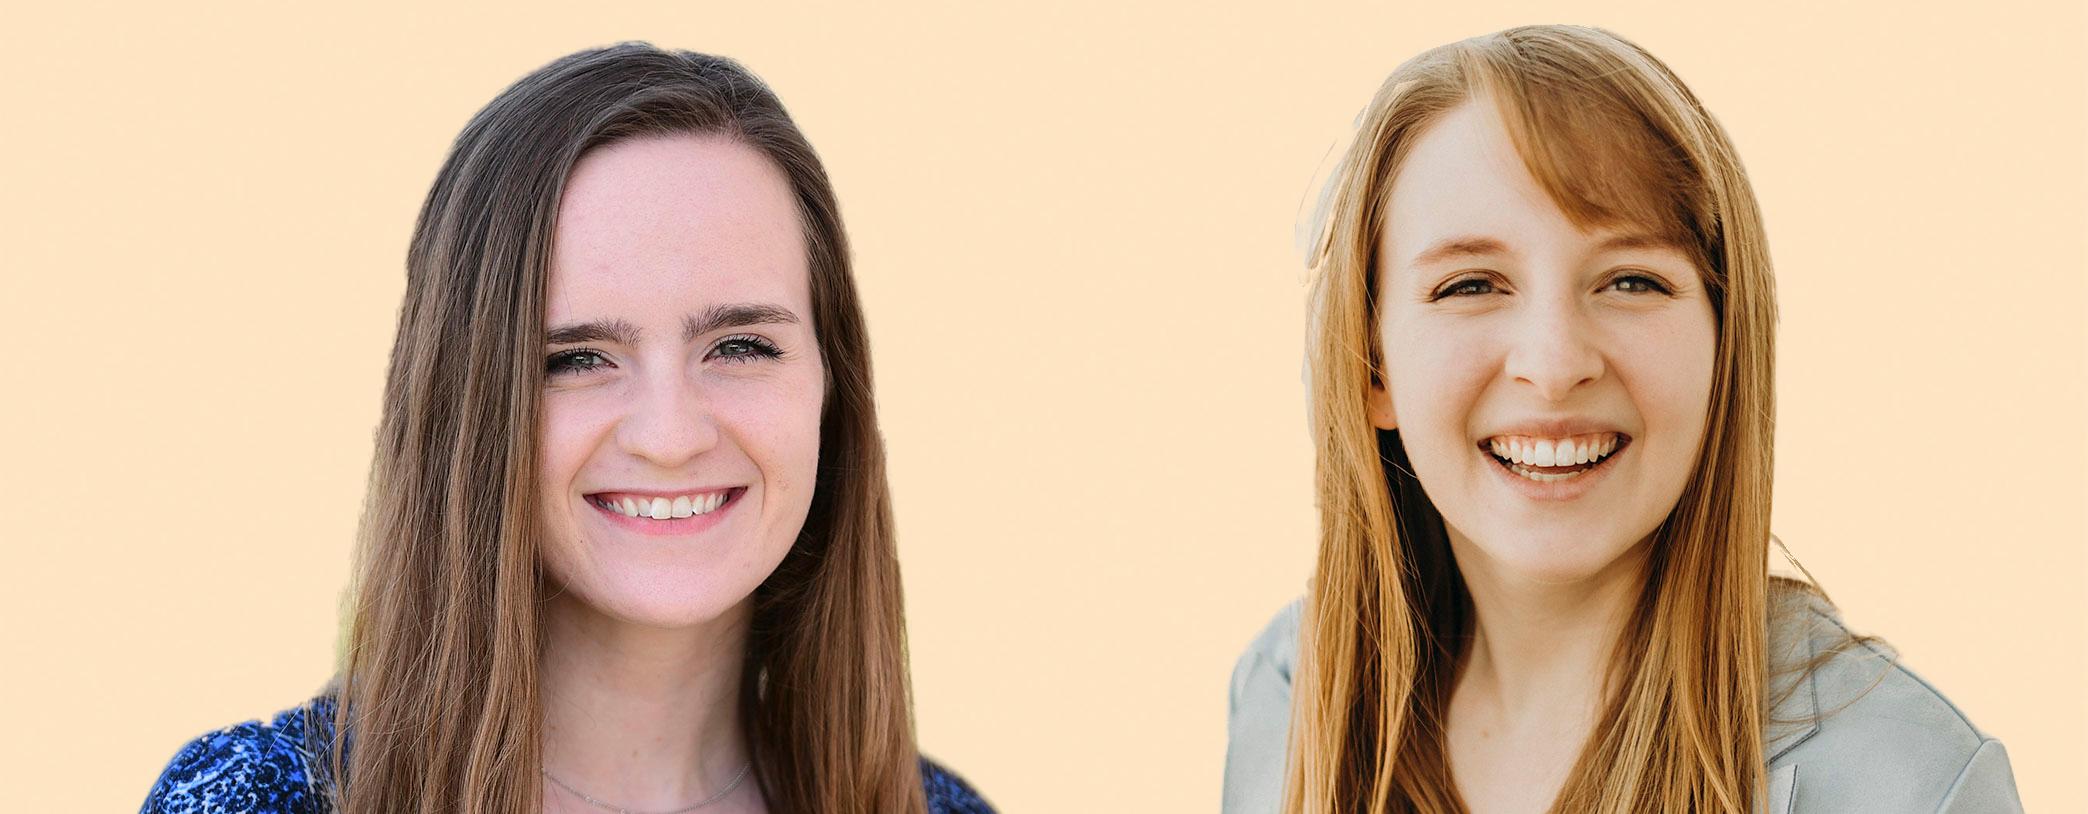 S4:E12 | Tessa Landrum and Nicole Hackett